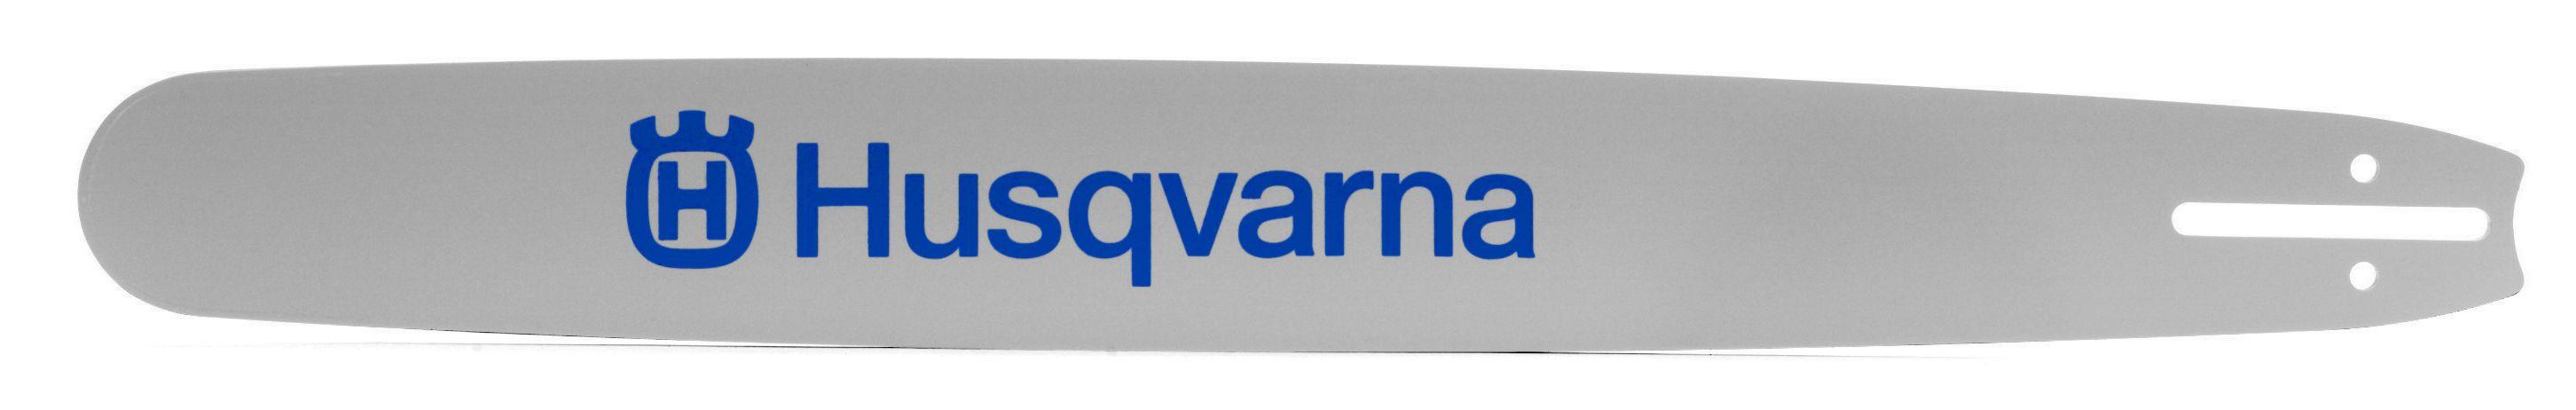 Шина цепной пилы Husqvarna 5019592-45 шина пильная husqvarna 16 3 8 1 3мм mini 5019592 56